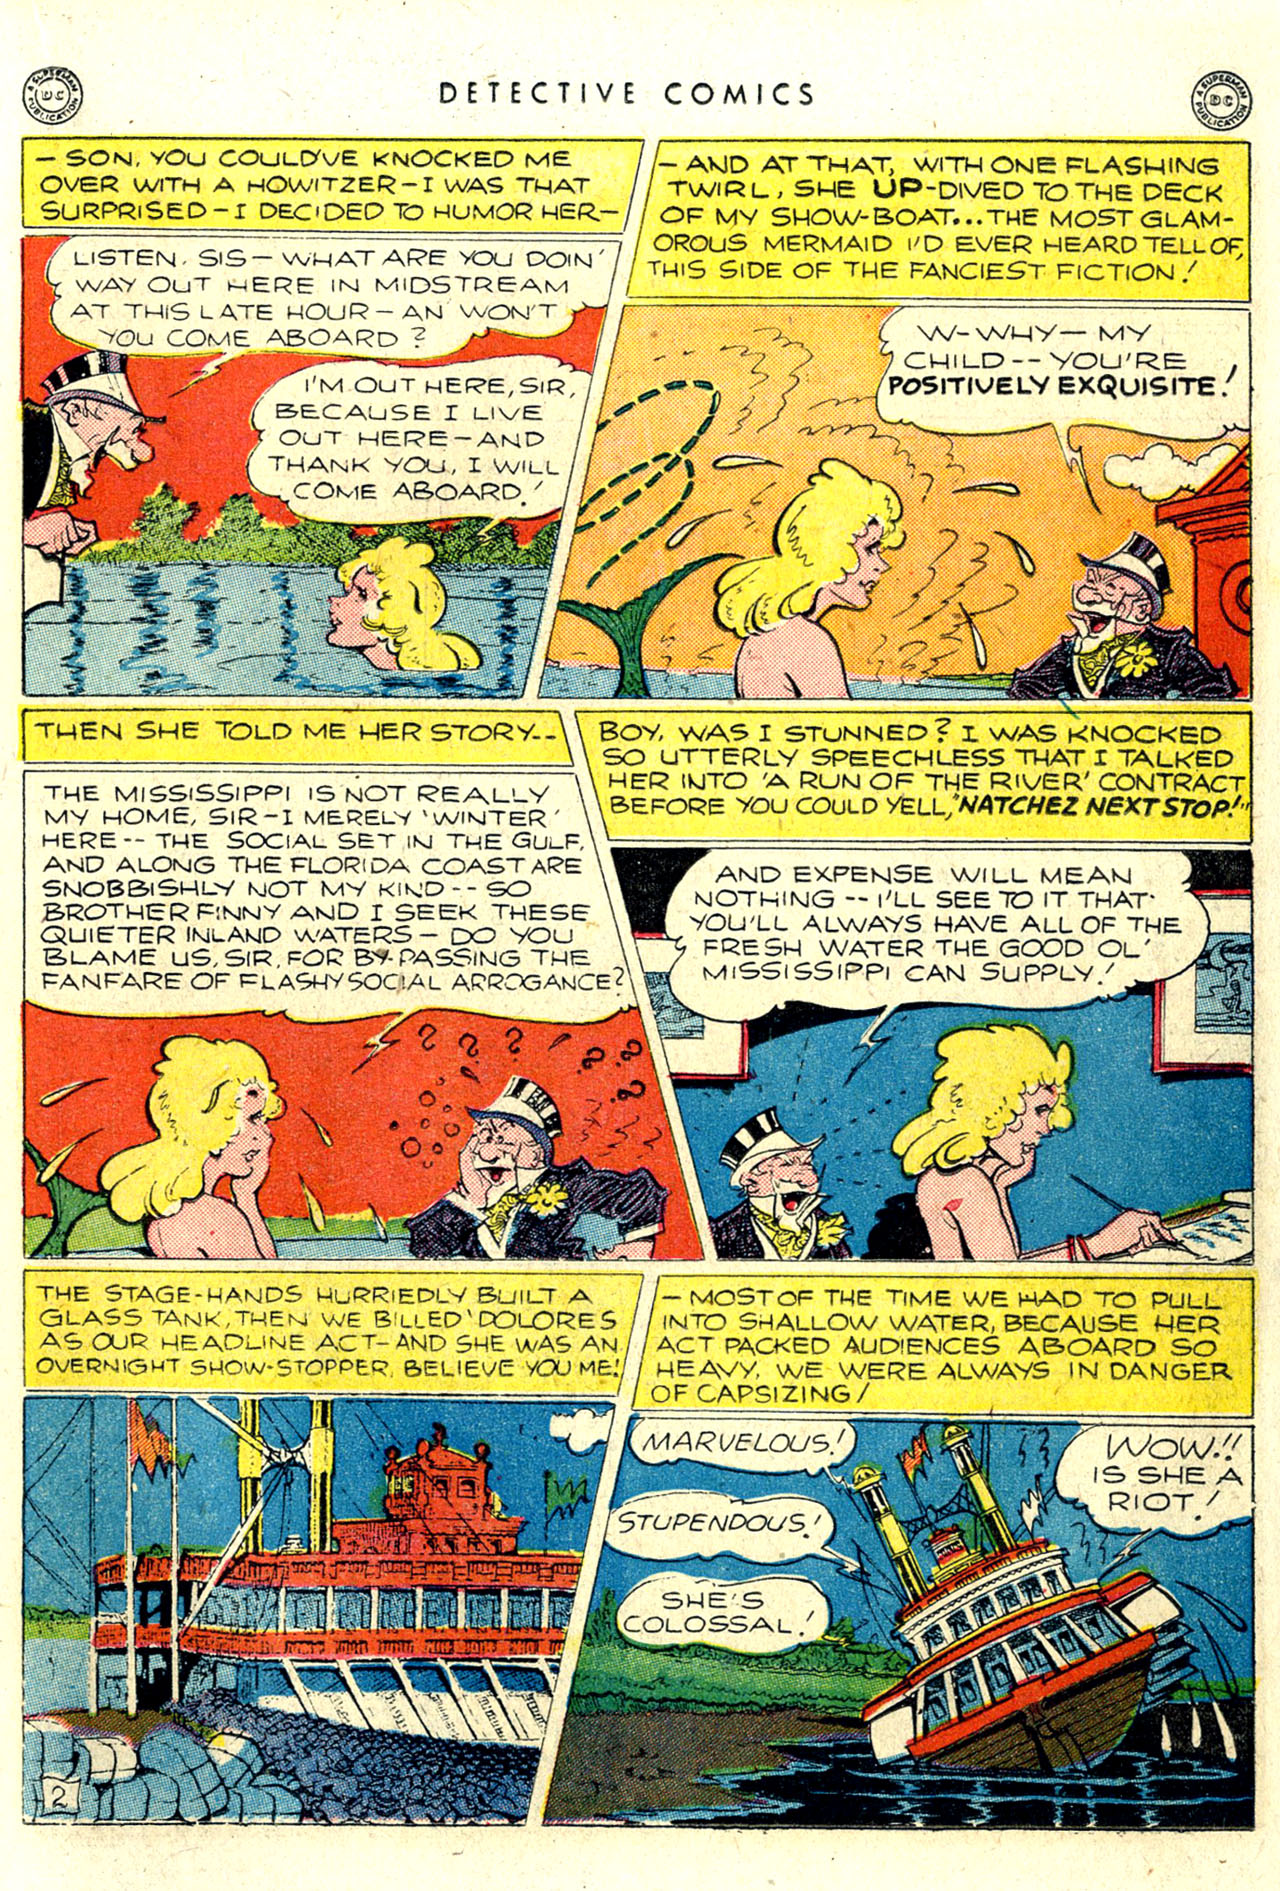 Read online Detective Comics (1937) comic -  Issue #100 - 23